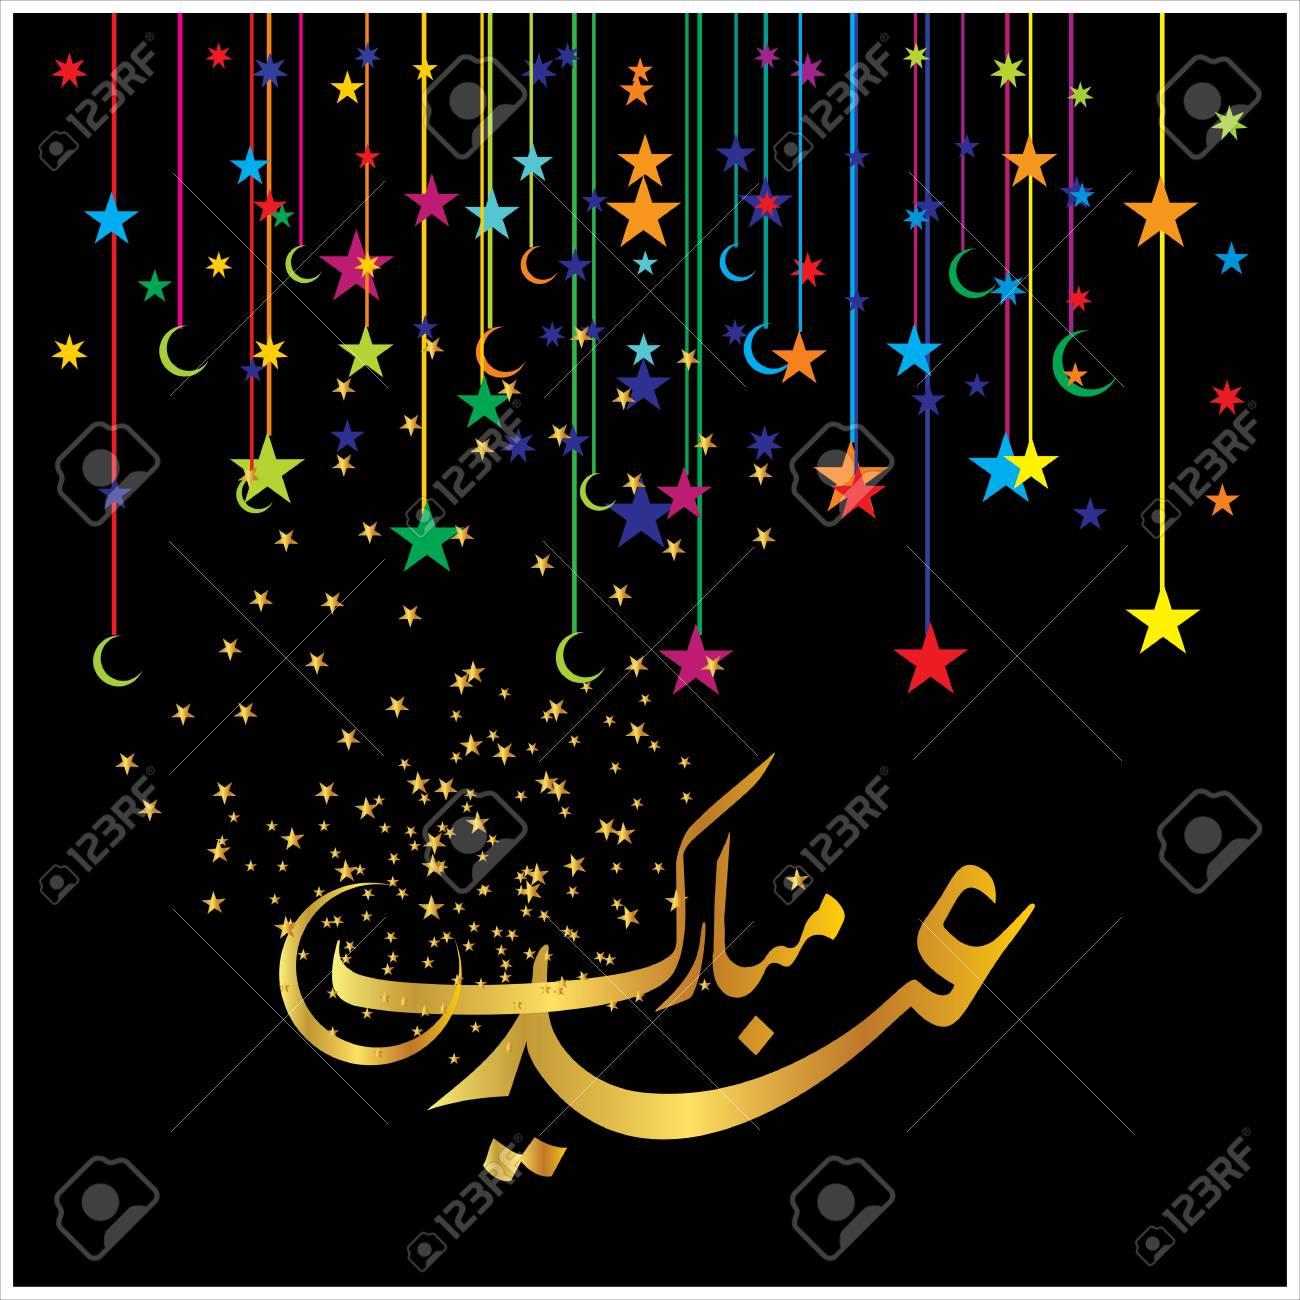 Happy Eid Mubarak Arabic Calligraphy For Greeting Card Muslims